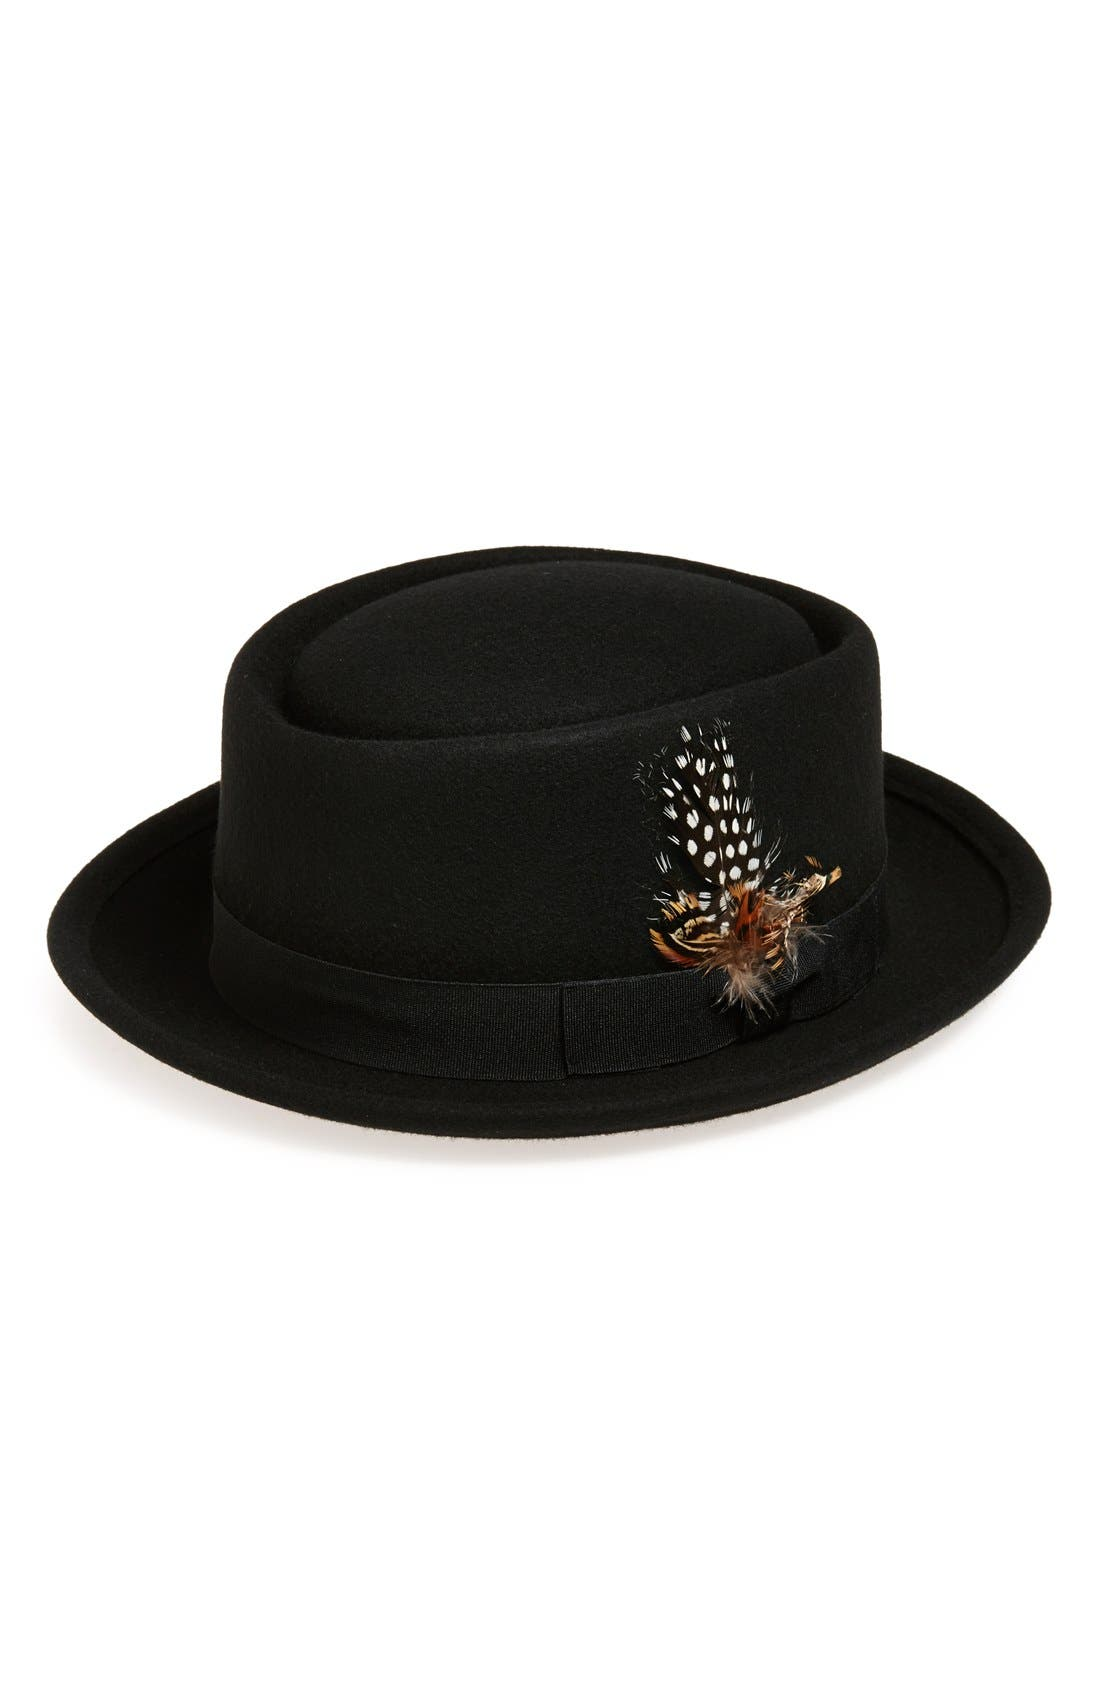 Main Image - Tildon Feather Embellished Wool Bowler Hat